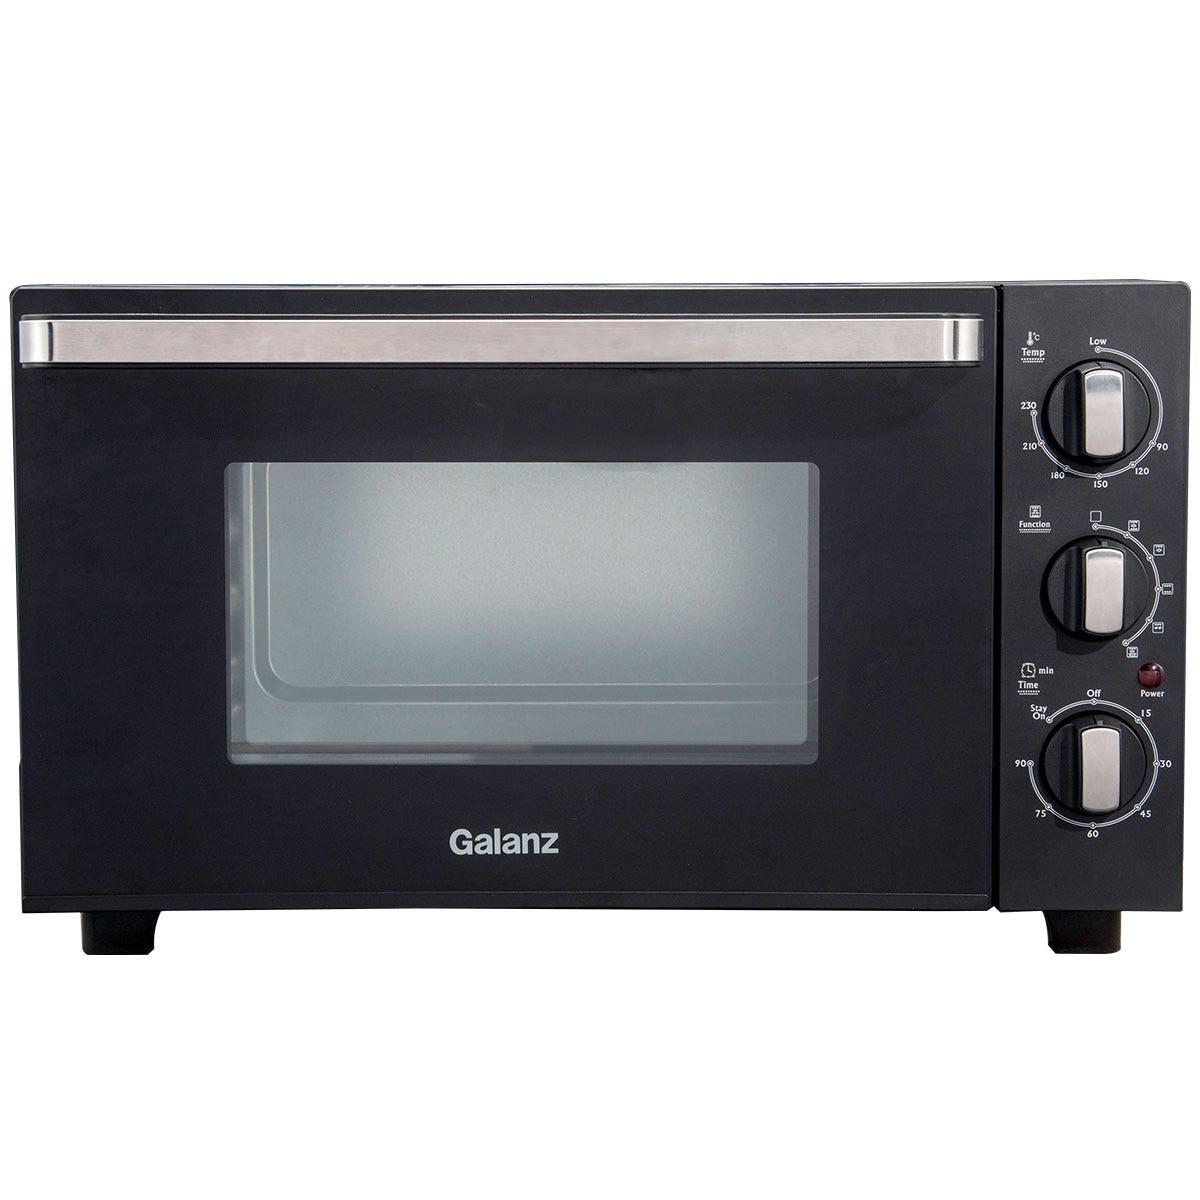 Galanz MOUK001B 30L 1500W Mini Convection Oven - Black